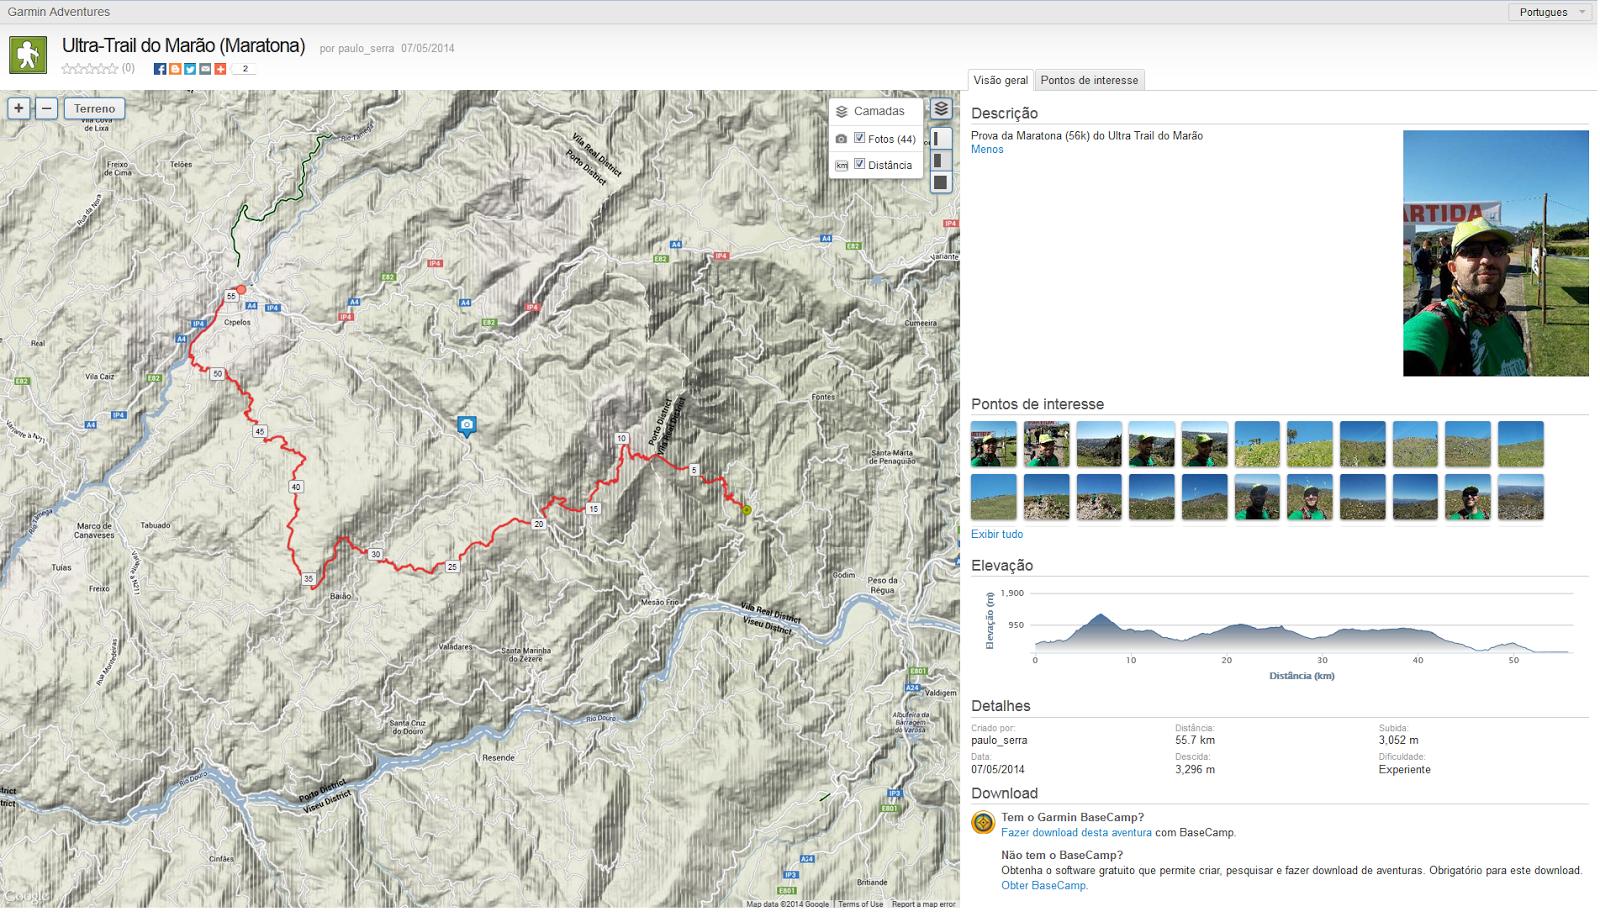 http://adventures.garmin.com/pt-BR/by/paulo-serra/ultra-trail-do-marao-maratona/#overview